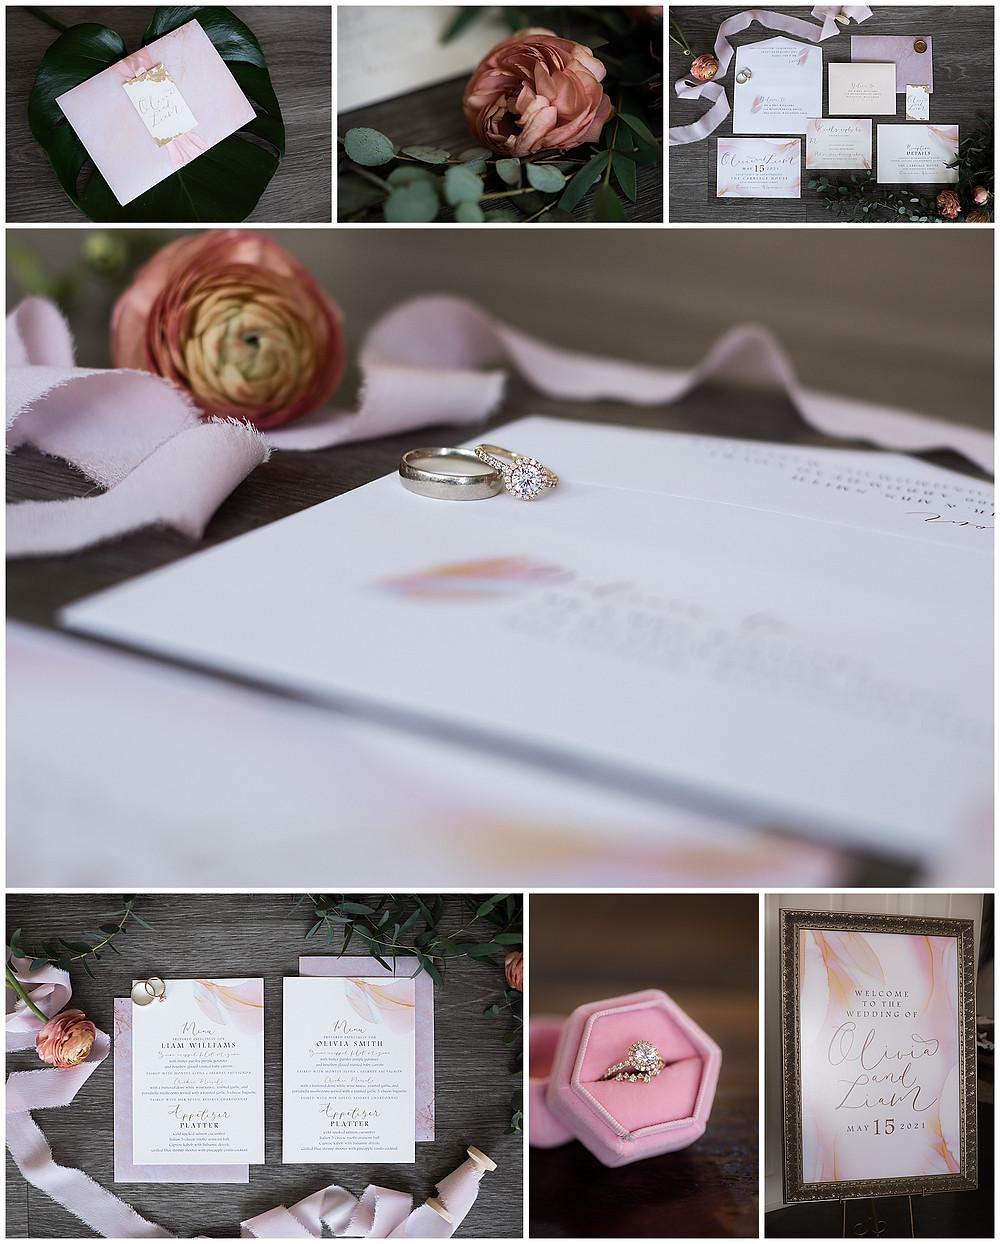 wisconsin wedding, wisconsin bride, wedding, wisconsin wedding venue, wedding venue, invitation, ring, wedding rings